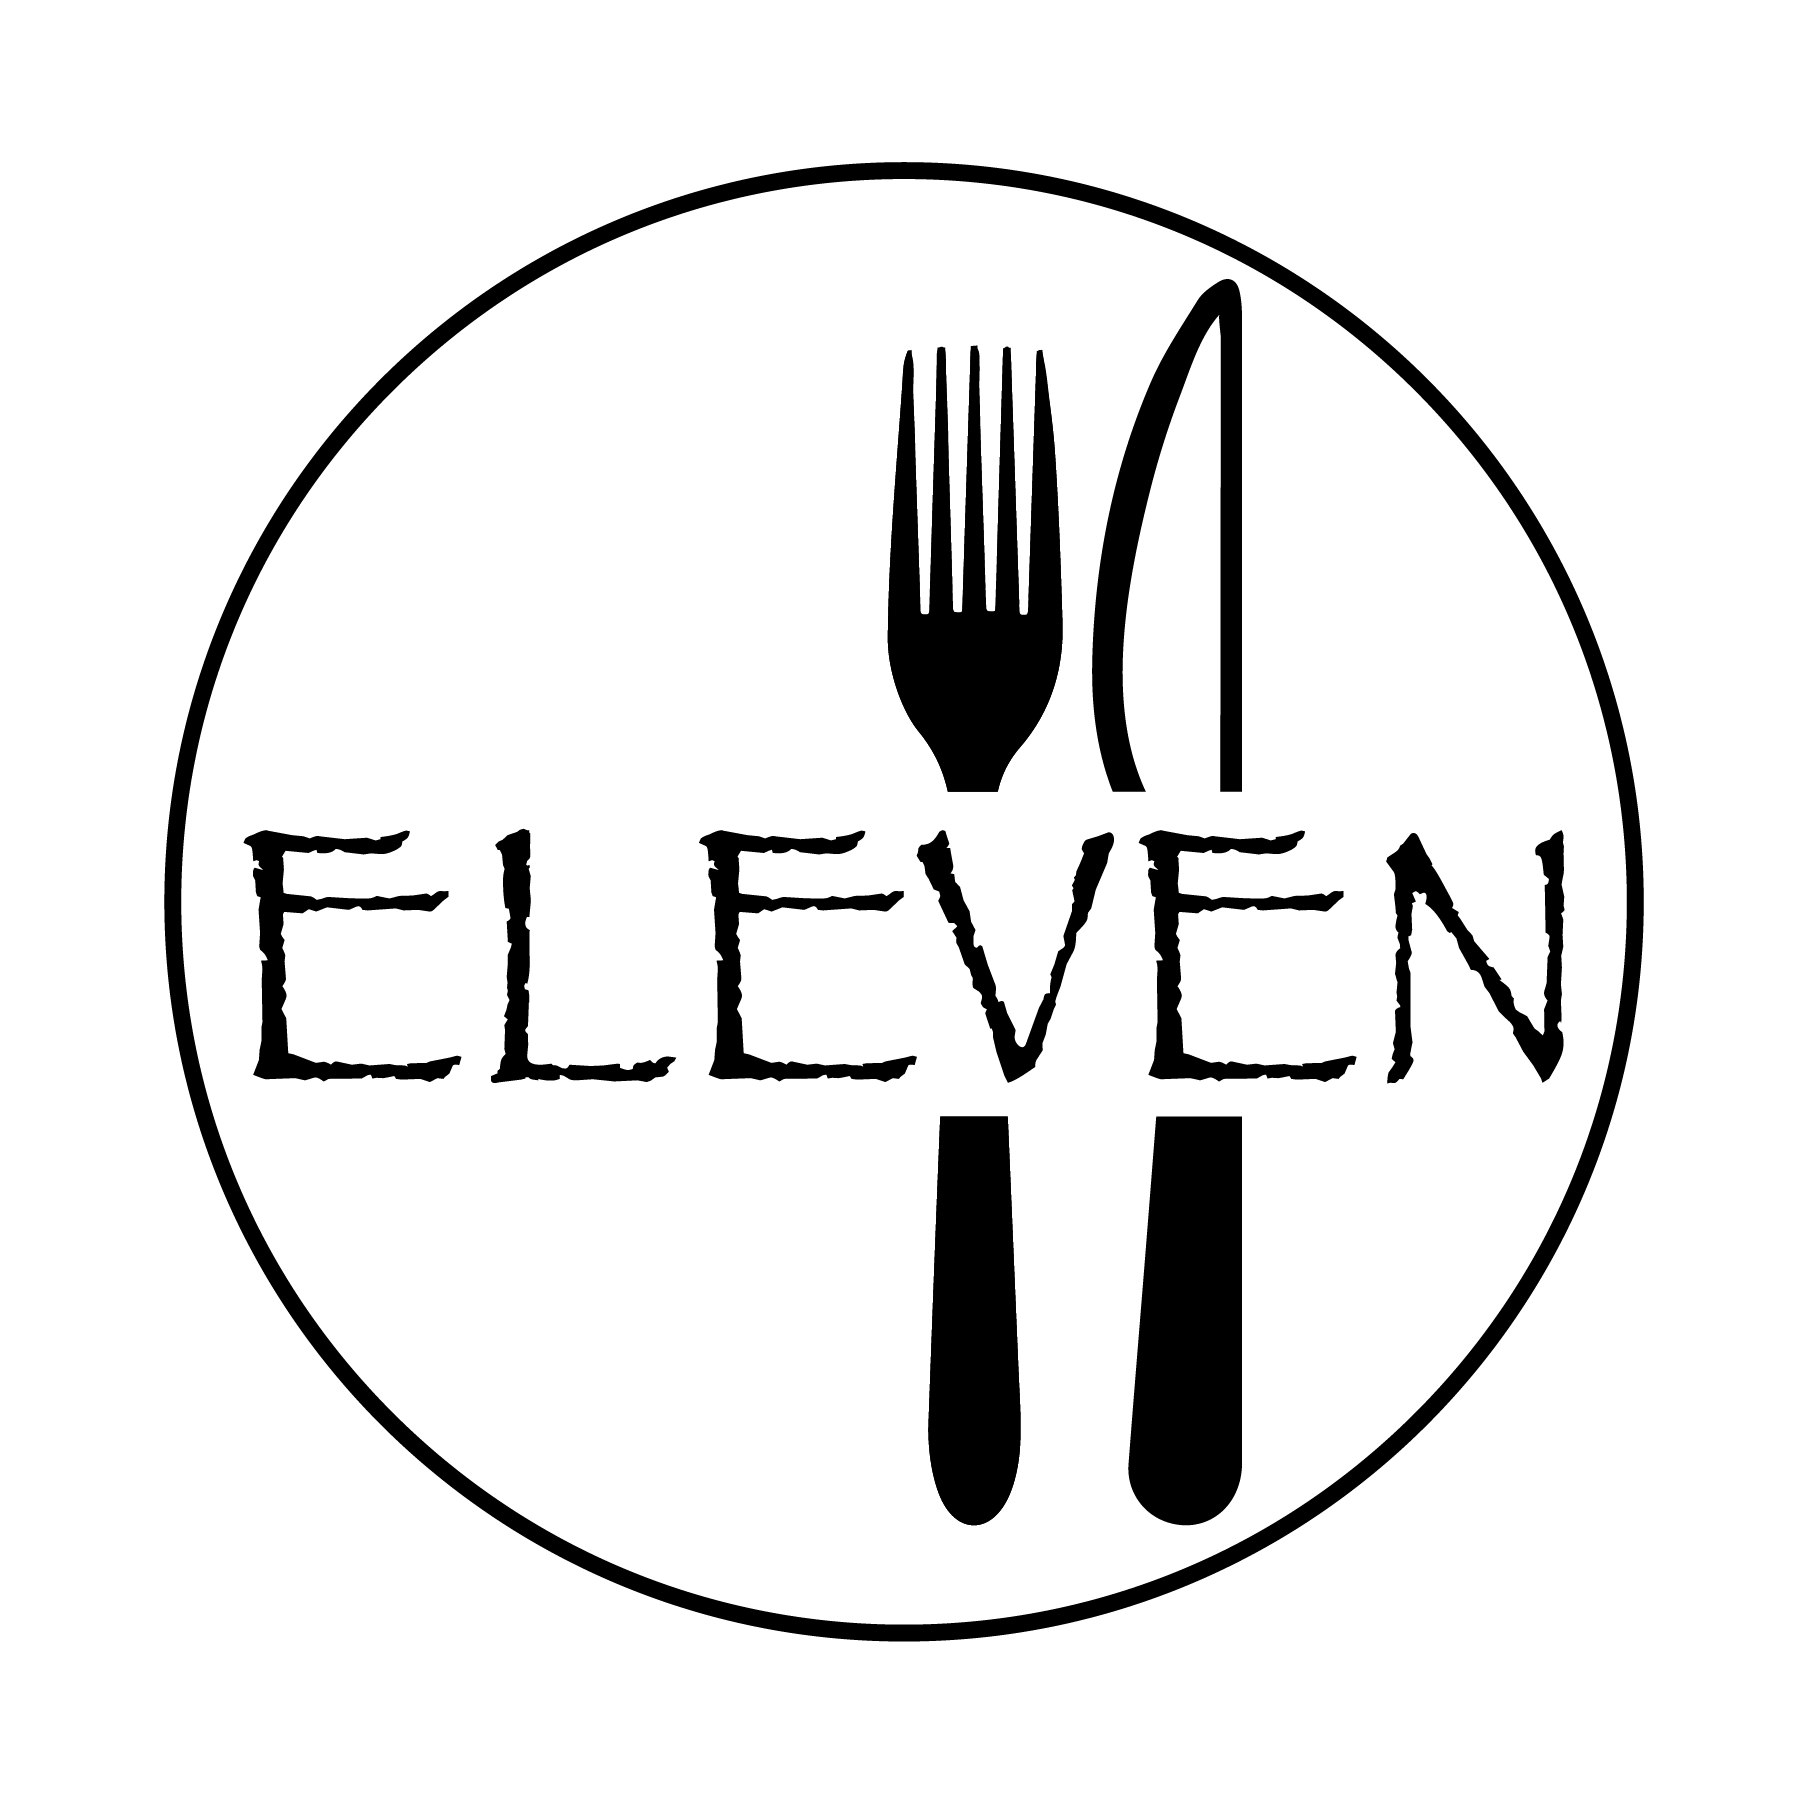 Eleven 11 logo